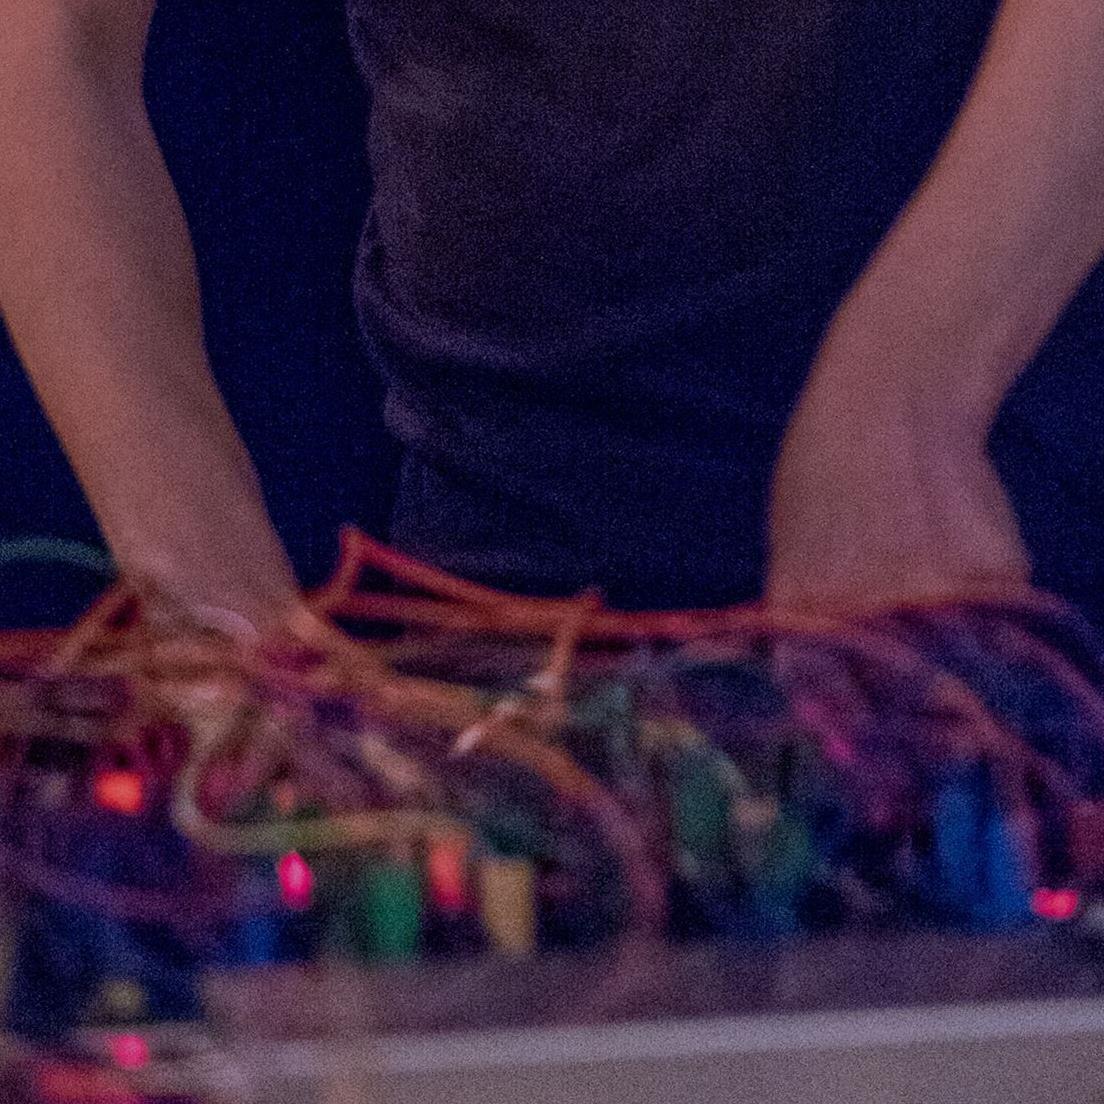 Halo: Experimentell ljudkonst & live-elektronik